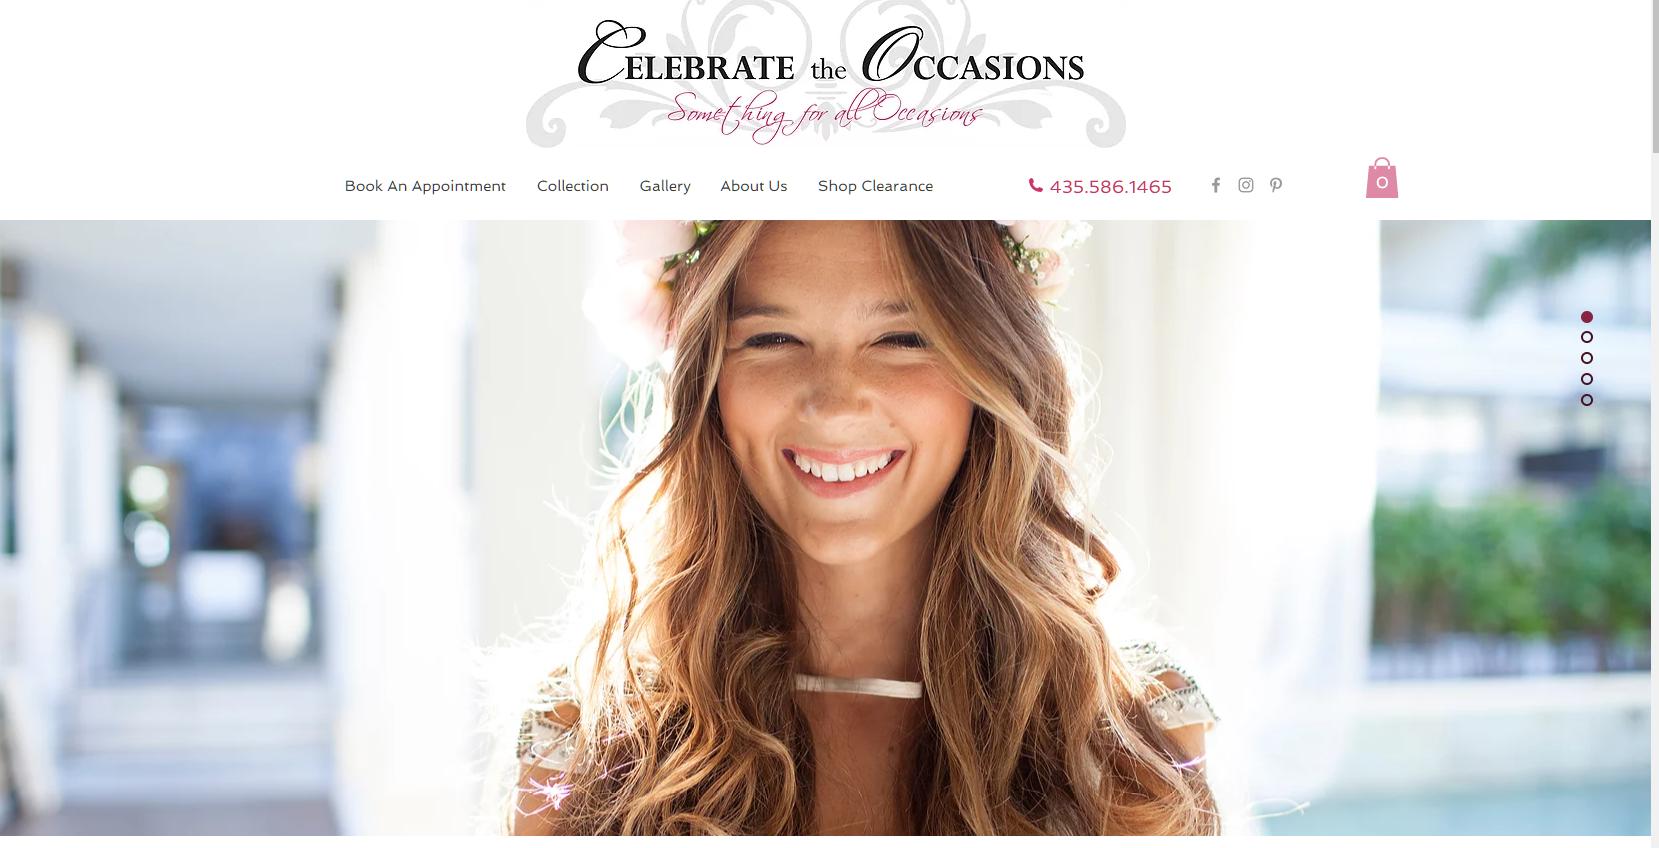 Celebrate the Ocassions